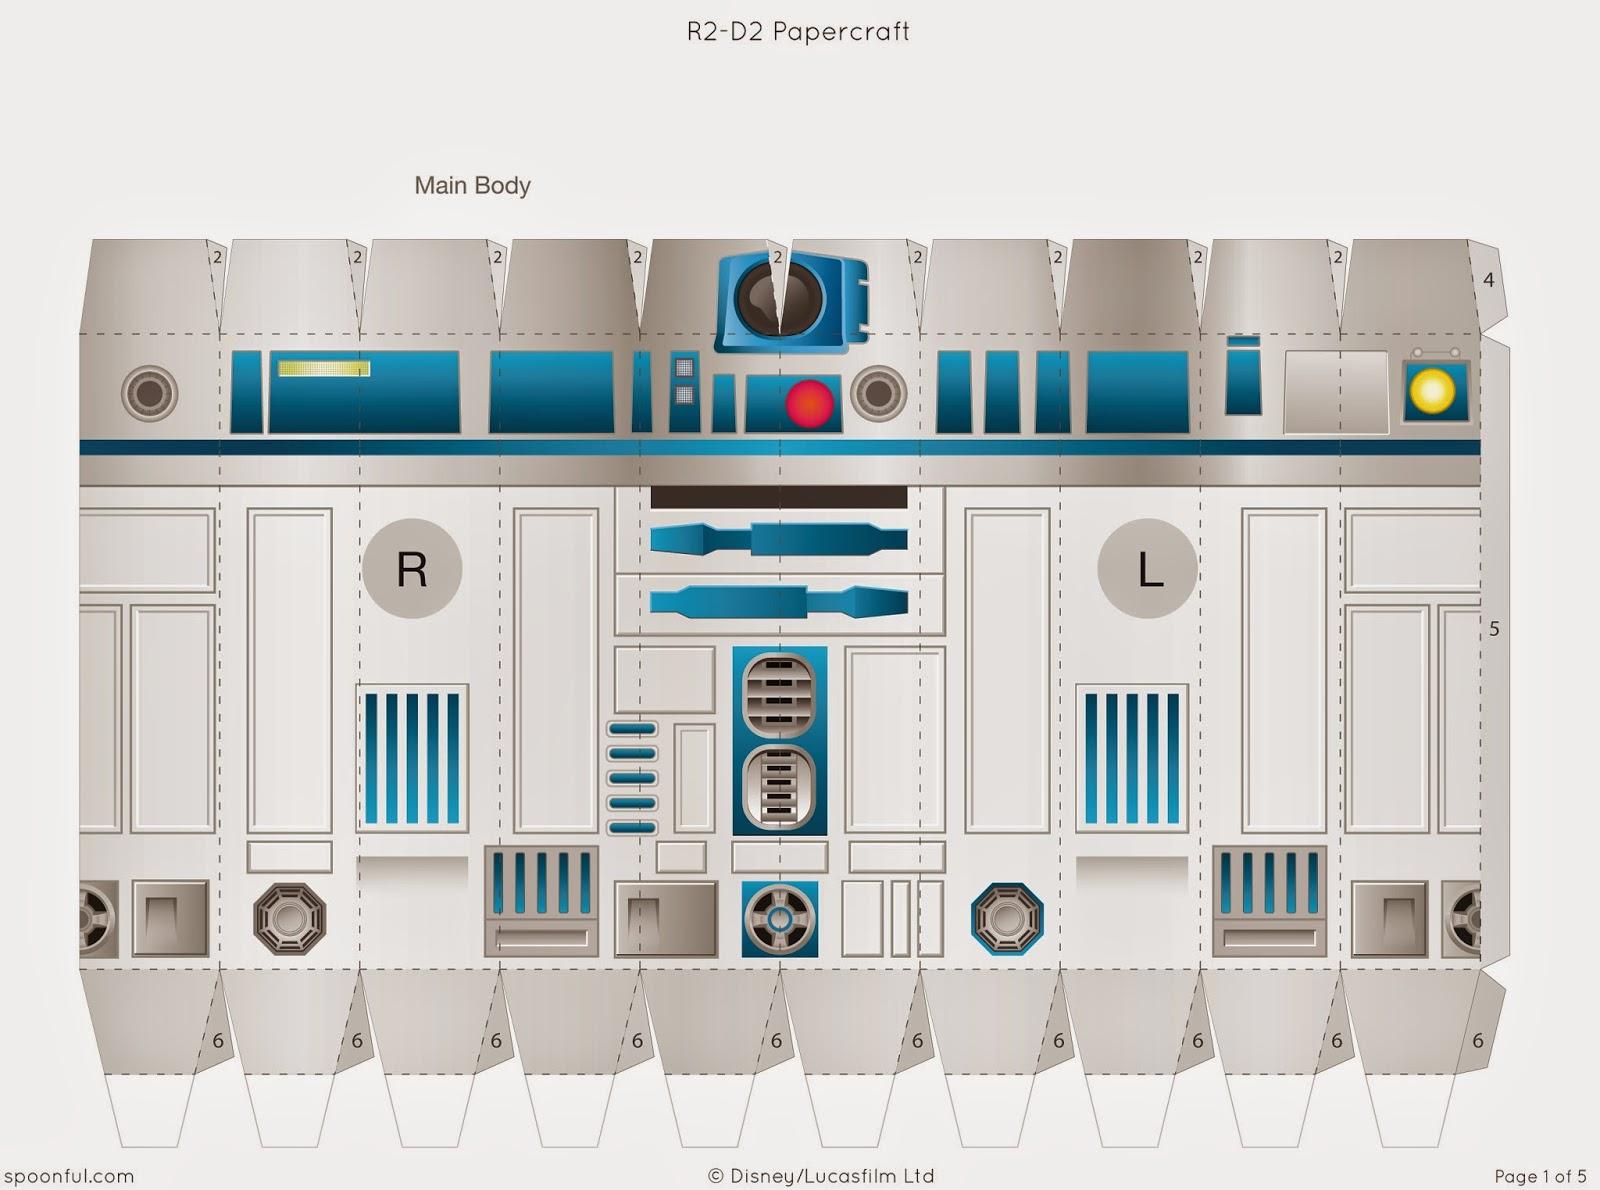 Descargable imprimible de R2-D2 de la saga de Star Wars para maqueta 3d-2